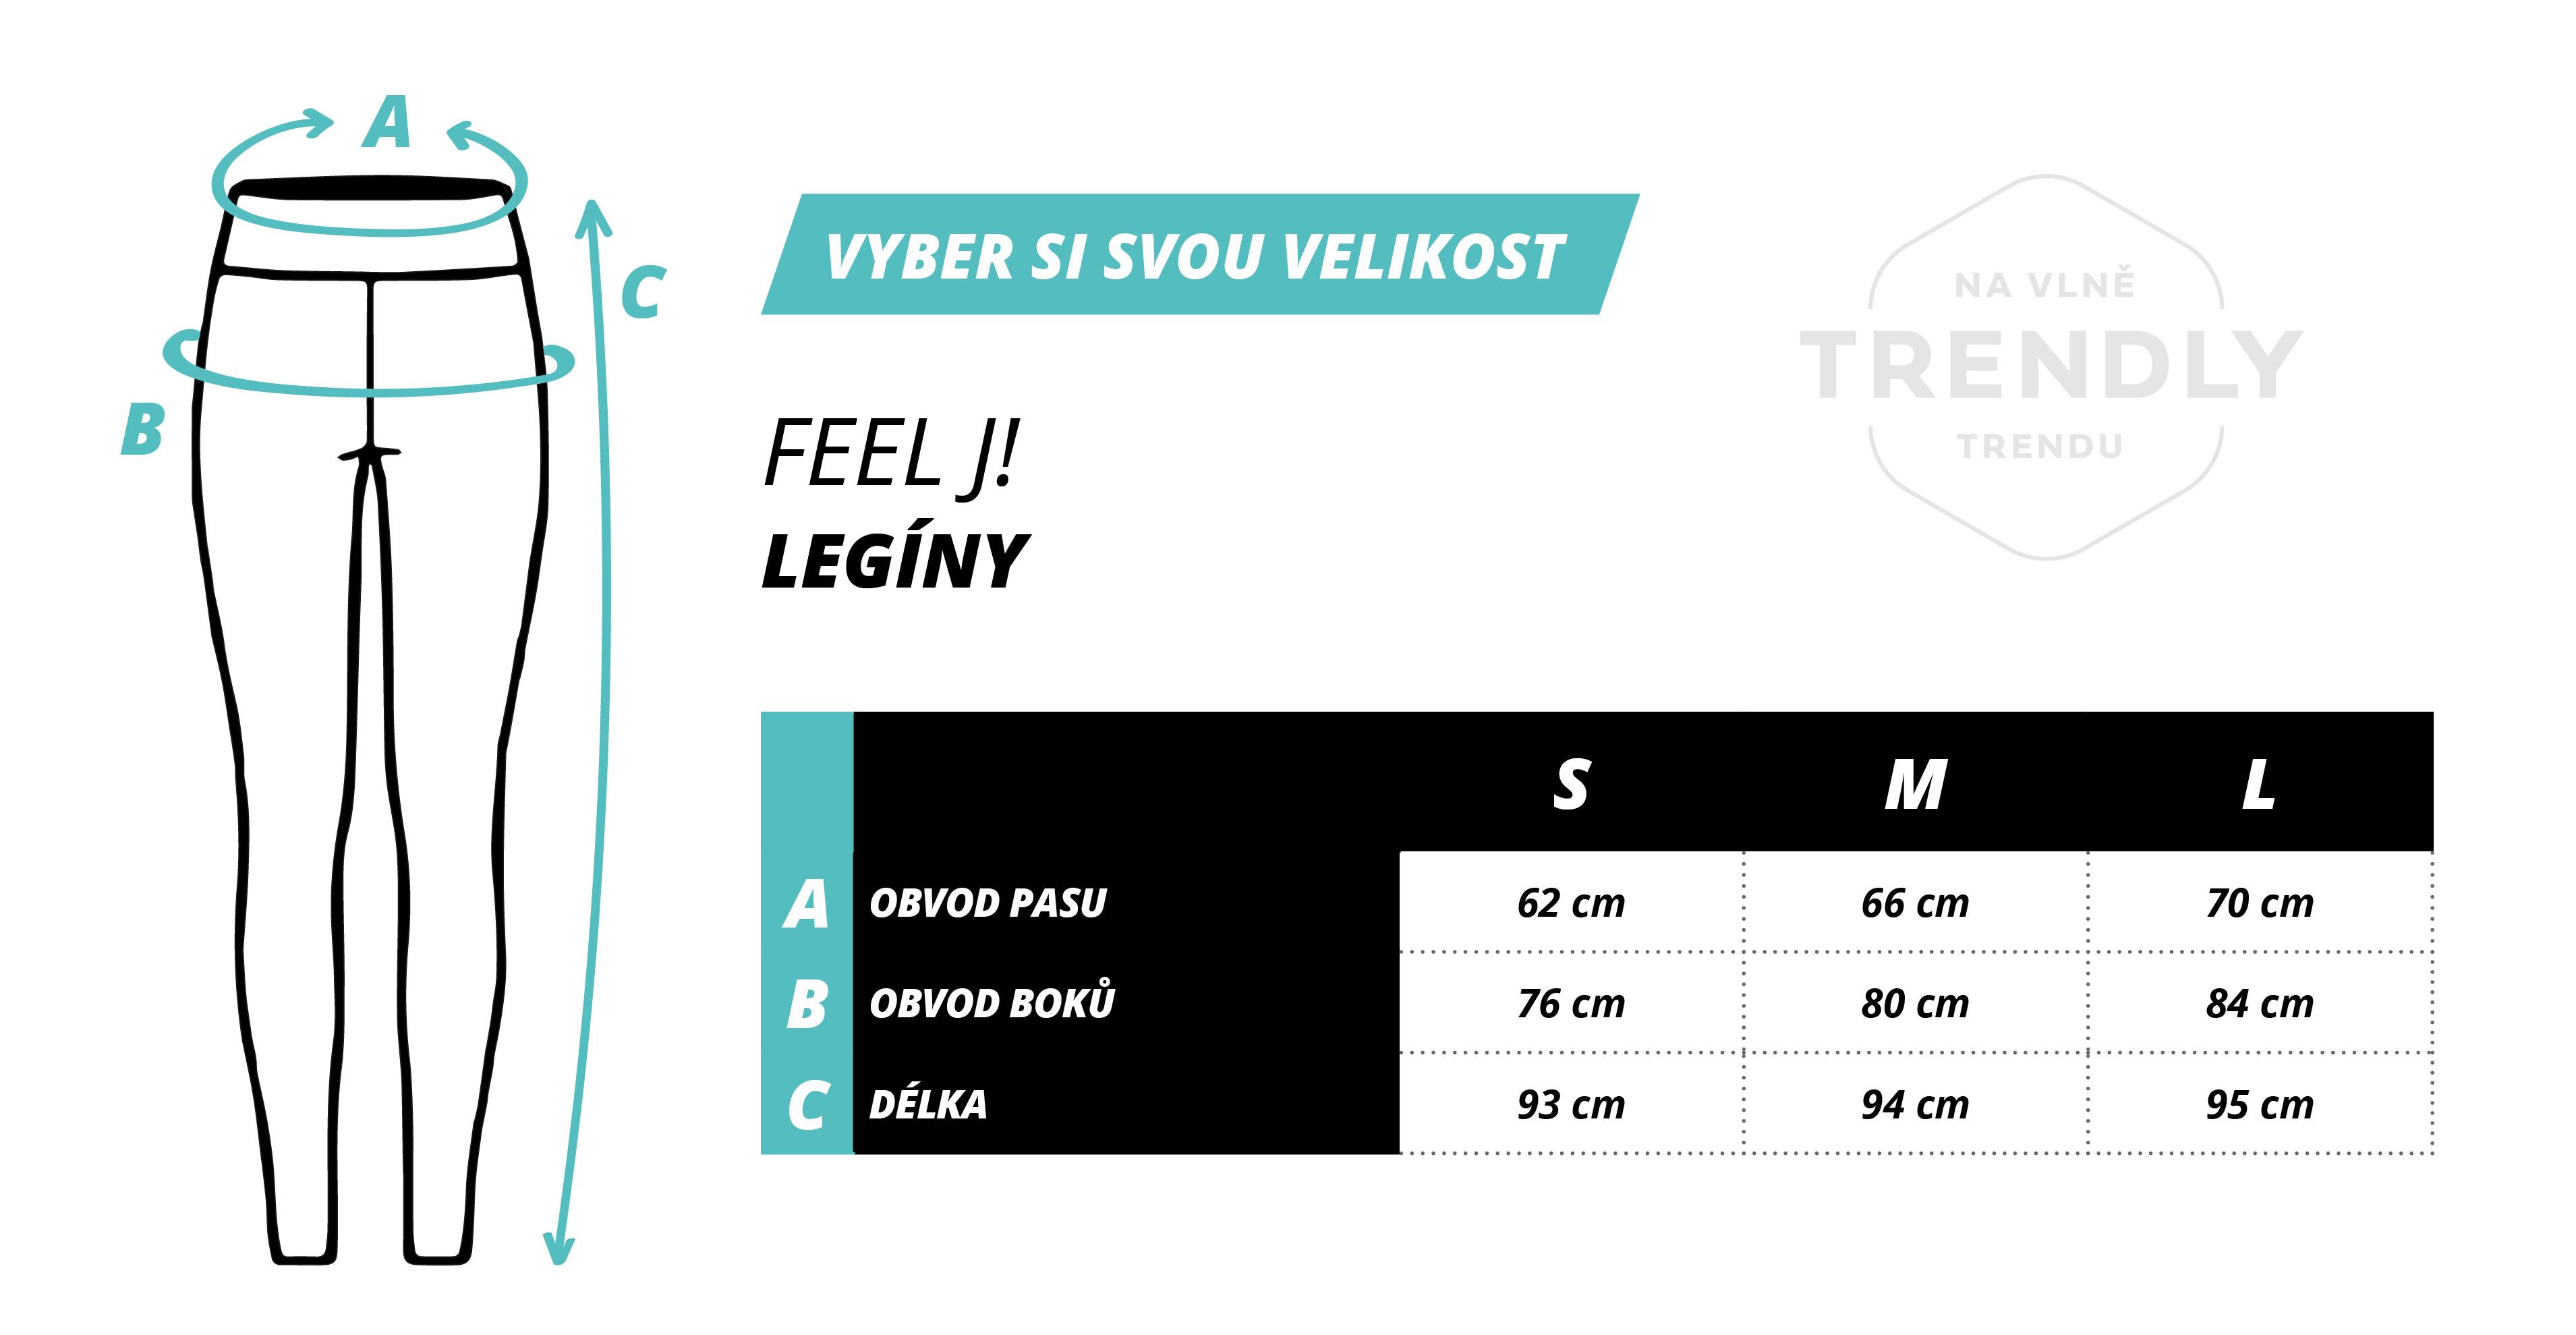 trendly_velikosti_leginy_feelj